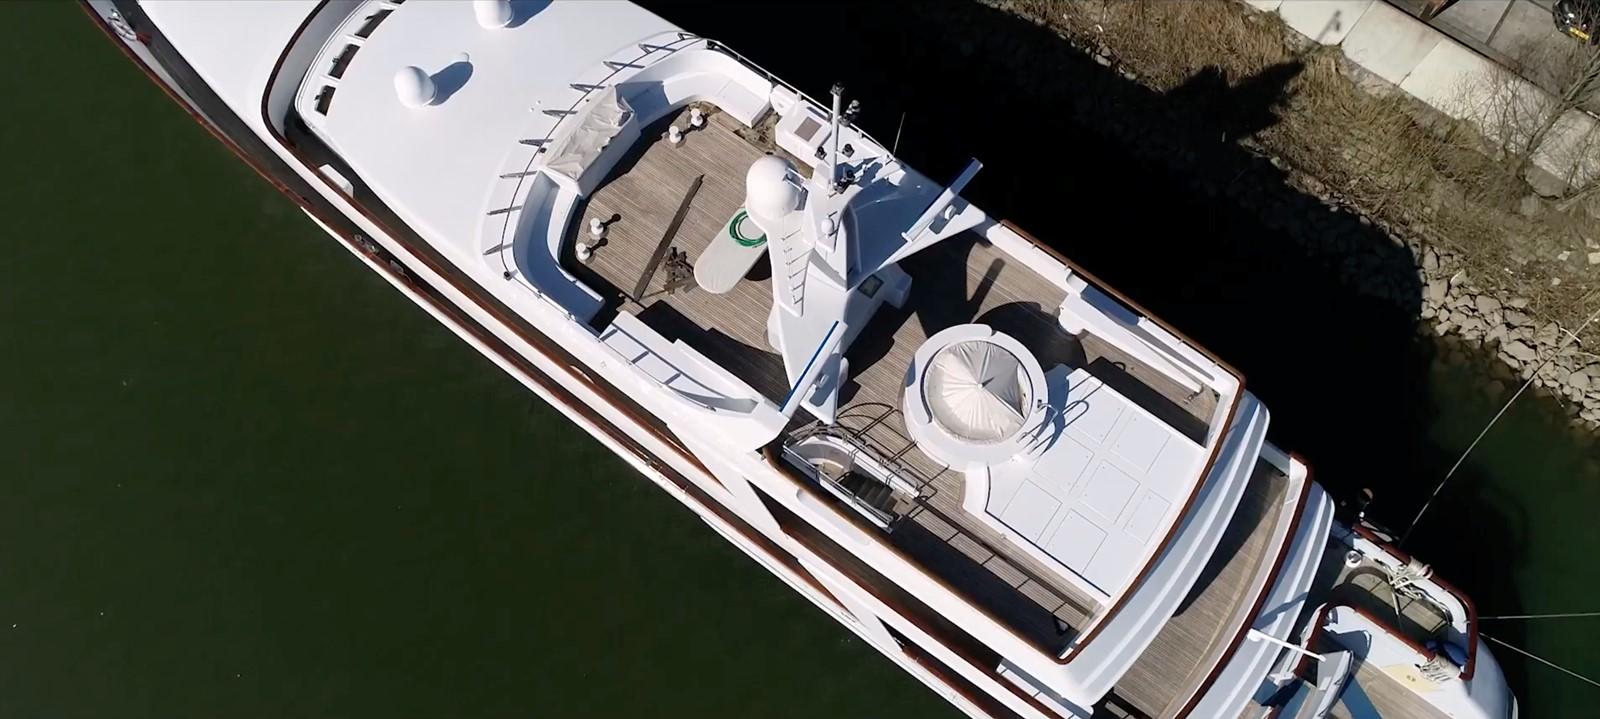 Aerial Upper Deck - 162 OCEANCO For Sale